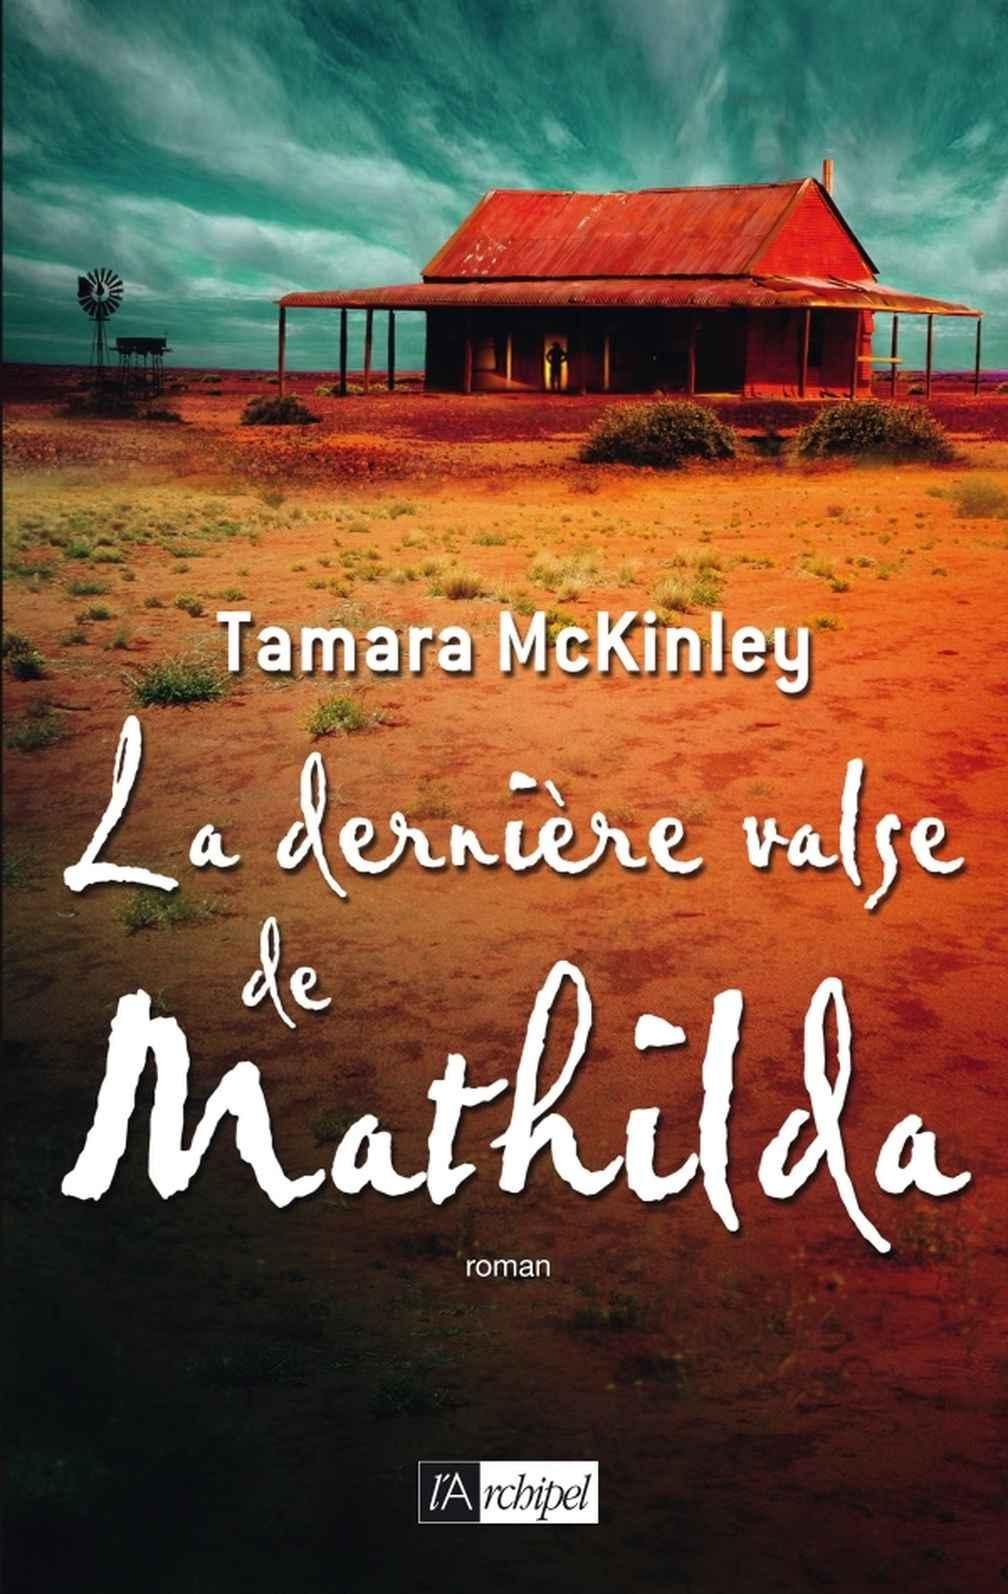 mckinley_la_derniere_valse_de_mathilda